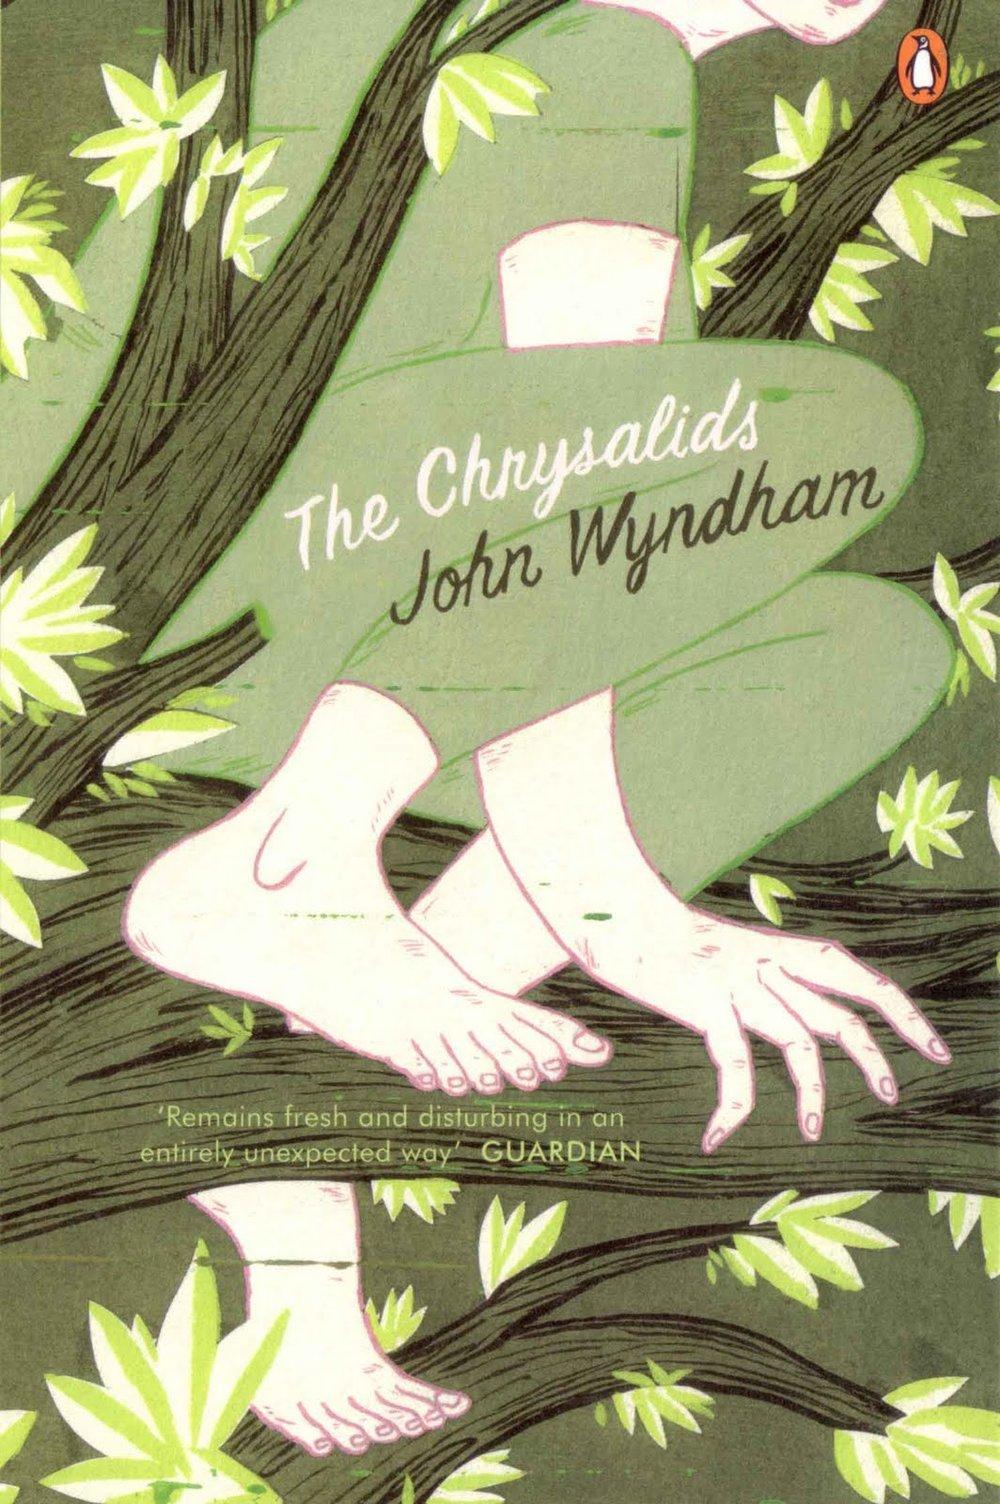 The Chrysalids - John Wyndham